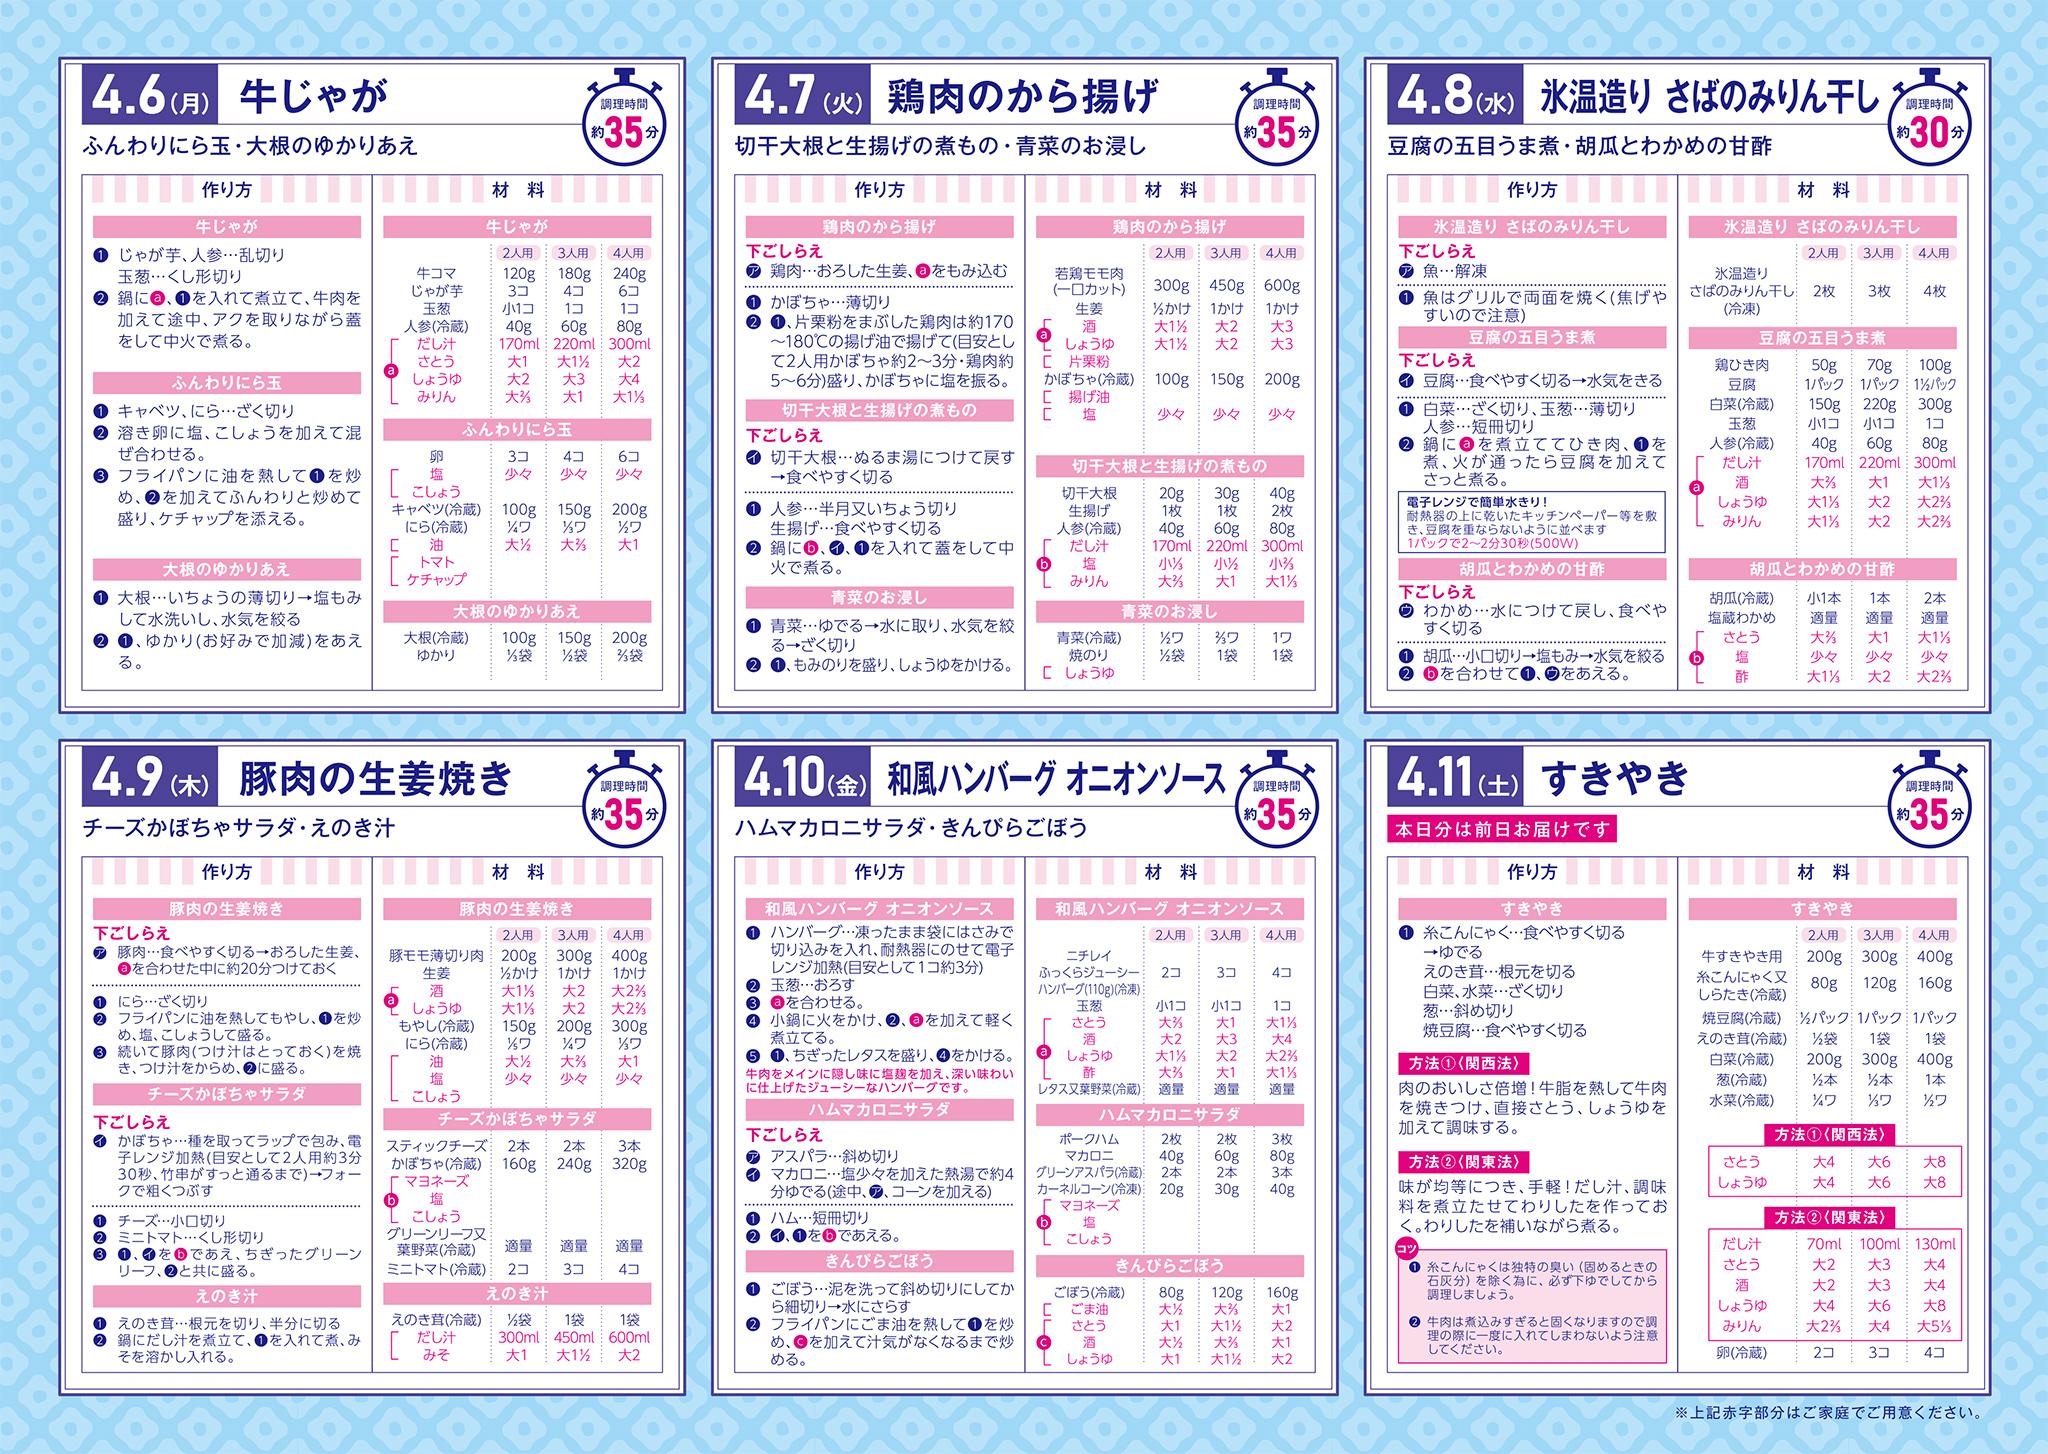 Y和歌山_0406週春の感謝祭SPメニュー_530857-01_BHB4_0303